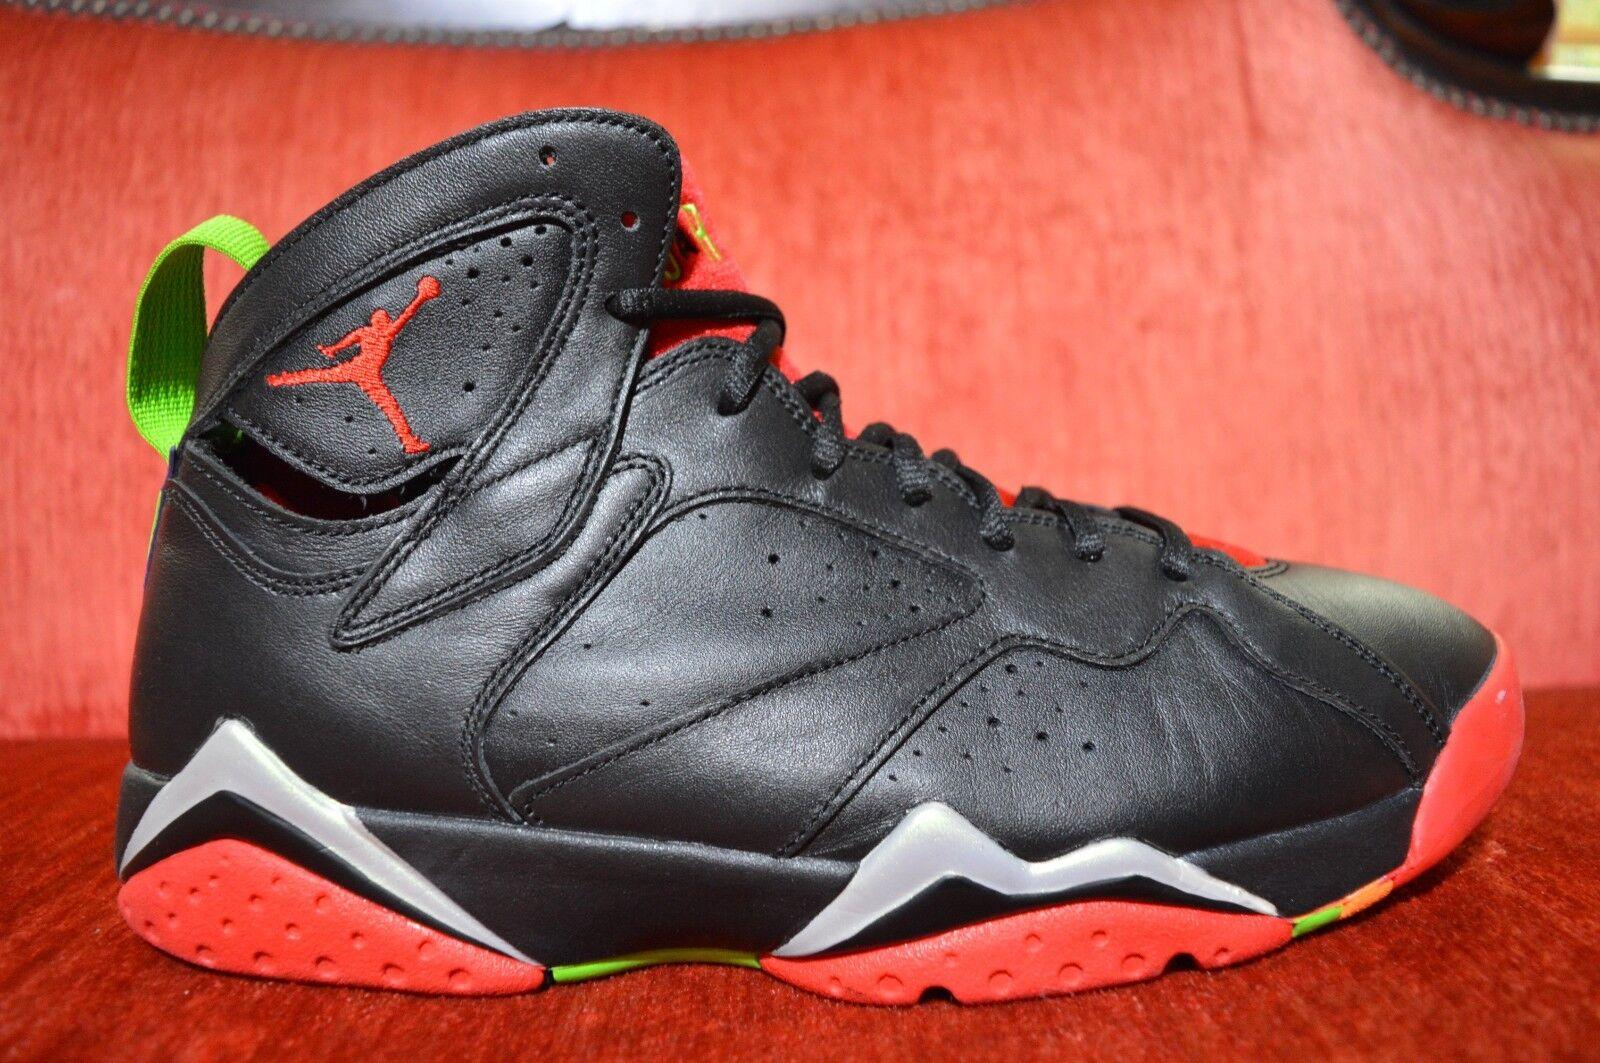 CLEAN Nike Air Jordan Retro 7 VII Size 9.5 Marvin The Martian Black 304775-029